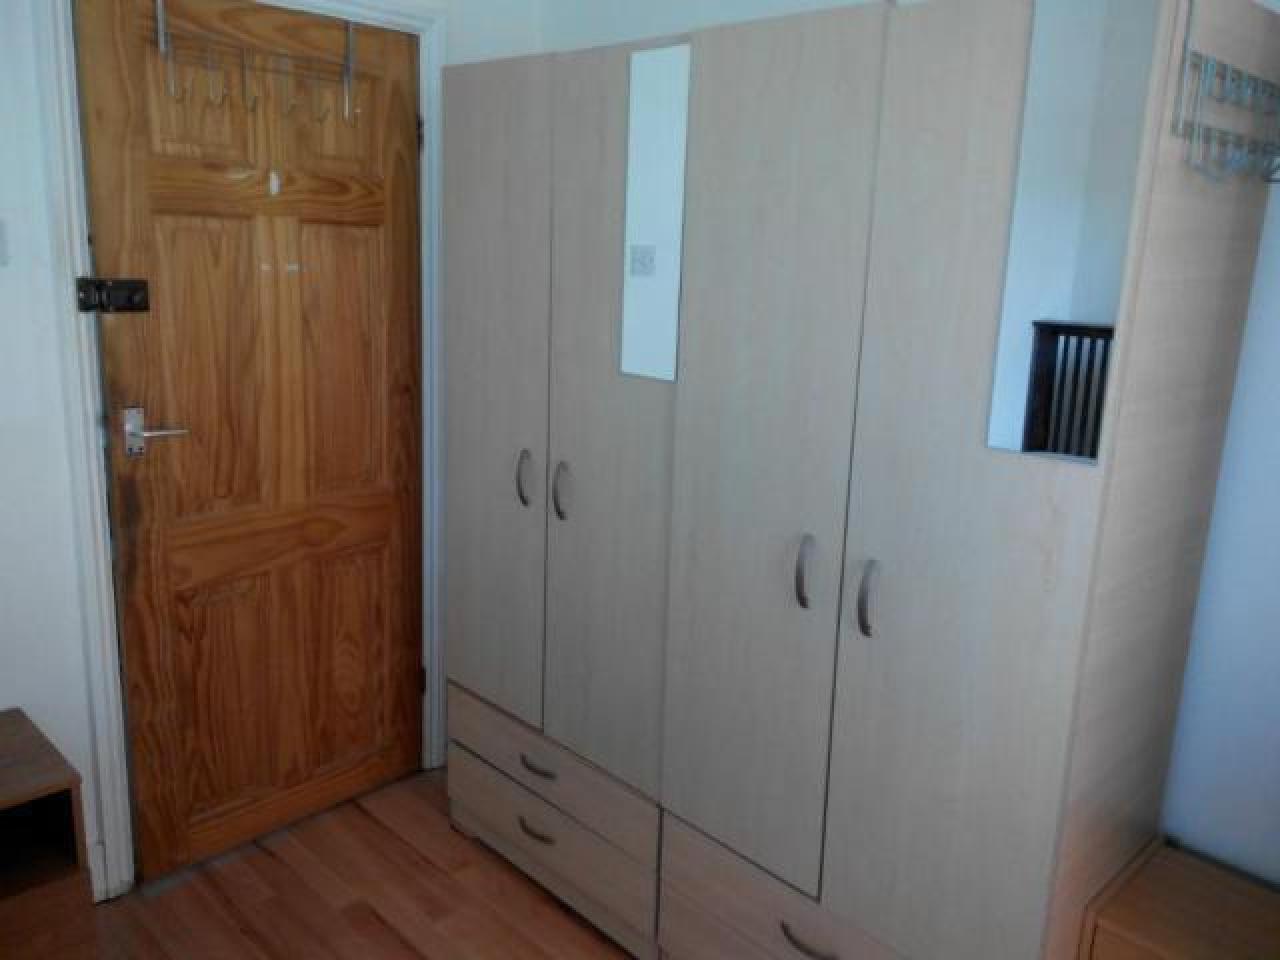 Двойная комната на Stratforde, зона 3, возле метро, все билы включени - 2